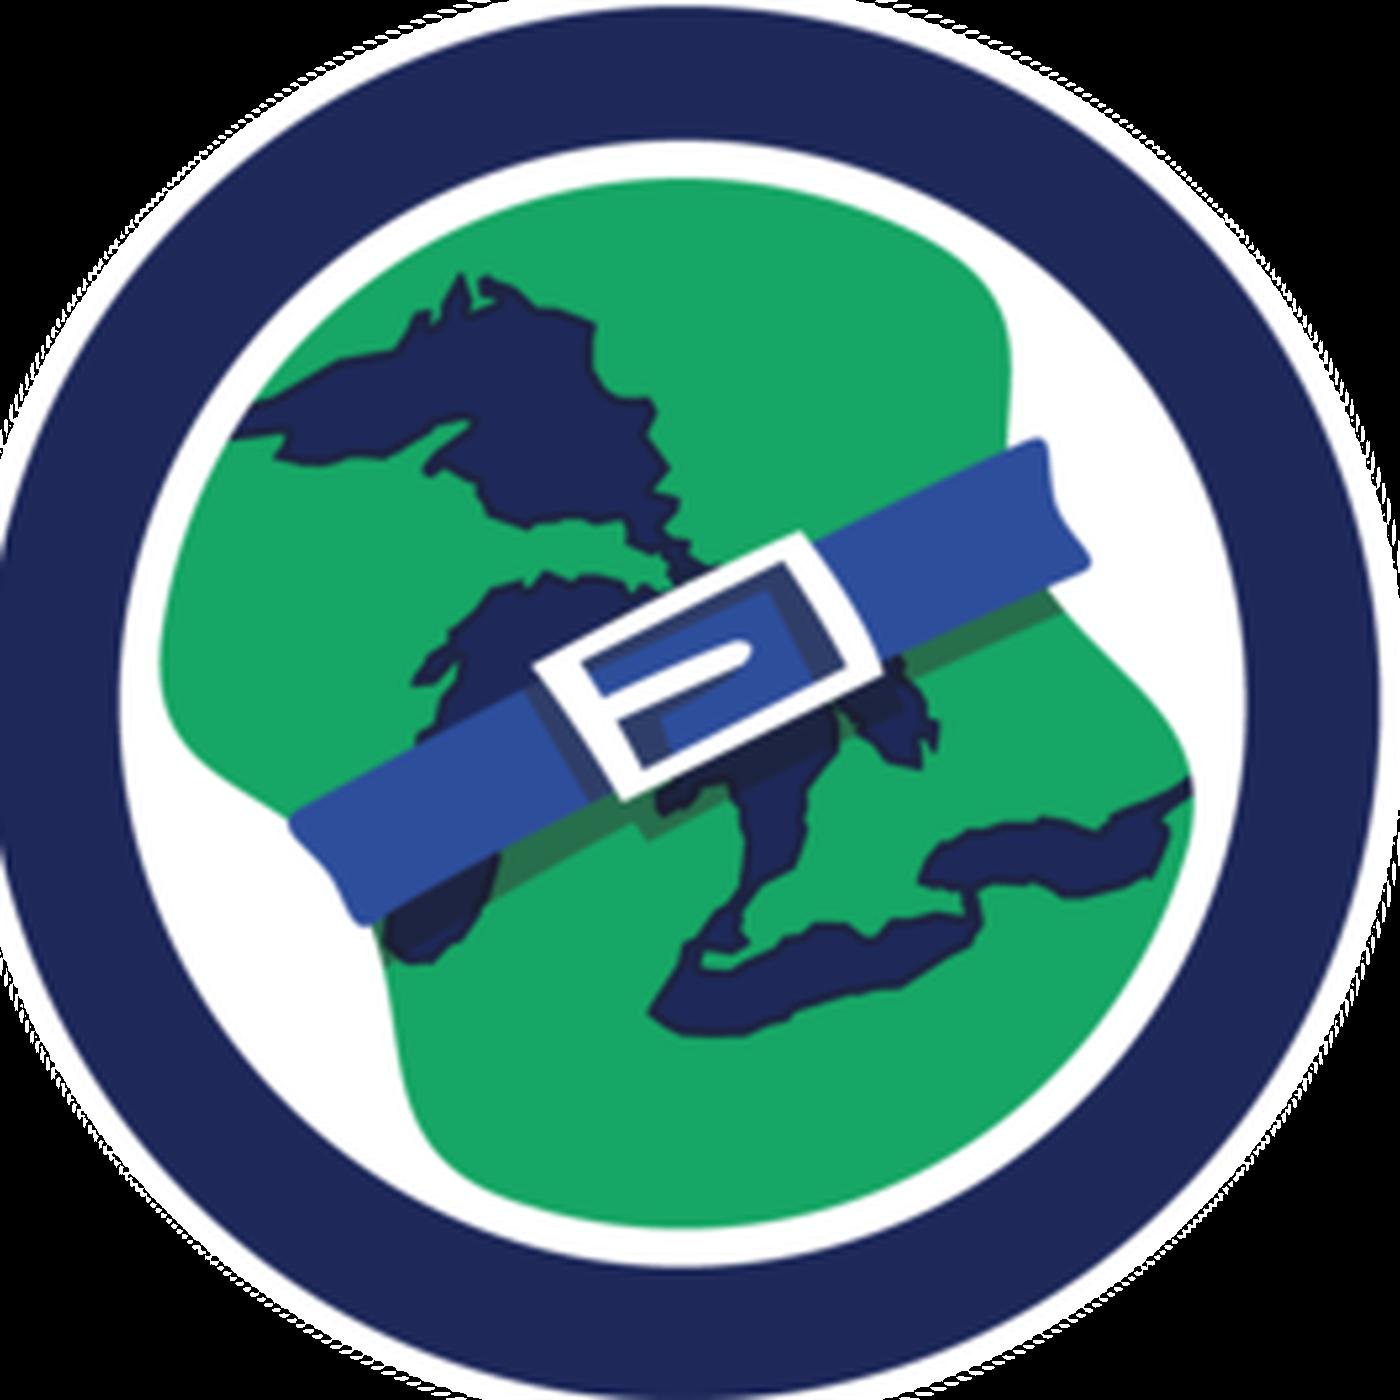 Dallas cowboy football clipart clipart royalty free download Northern Illinois' Joe Windsor Signs With Dallas Cowboys - Hustle Belt clipart royalty free download